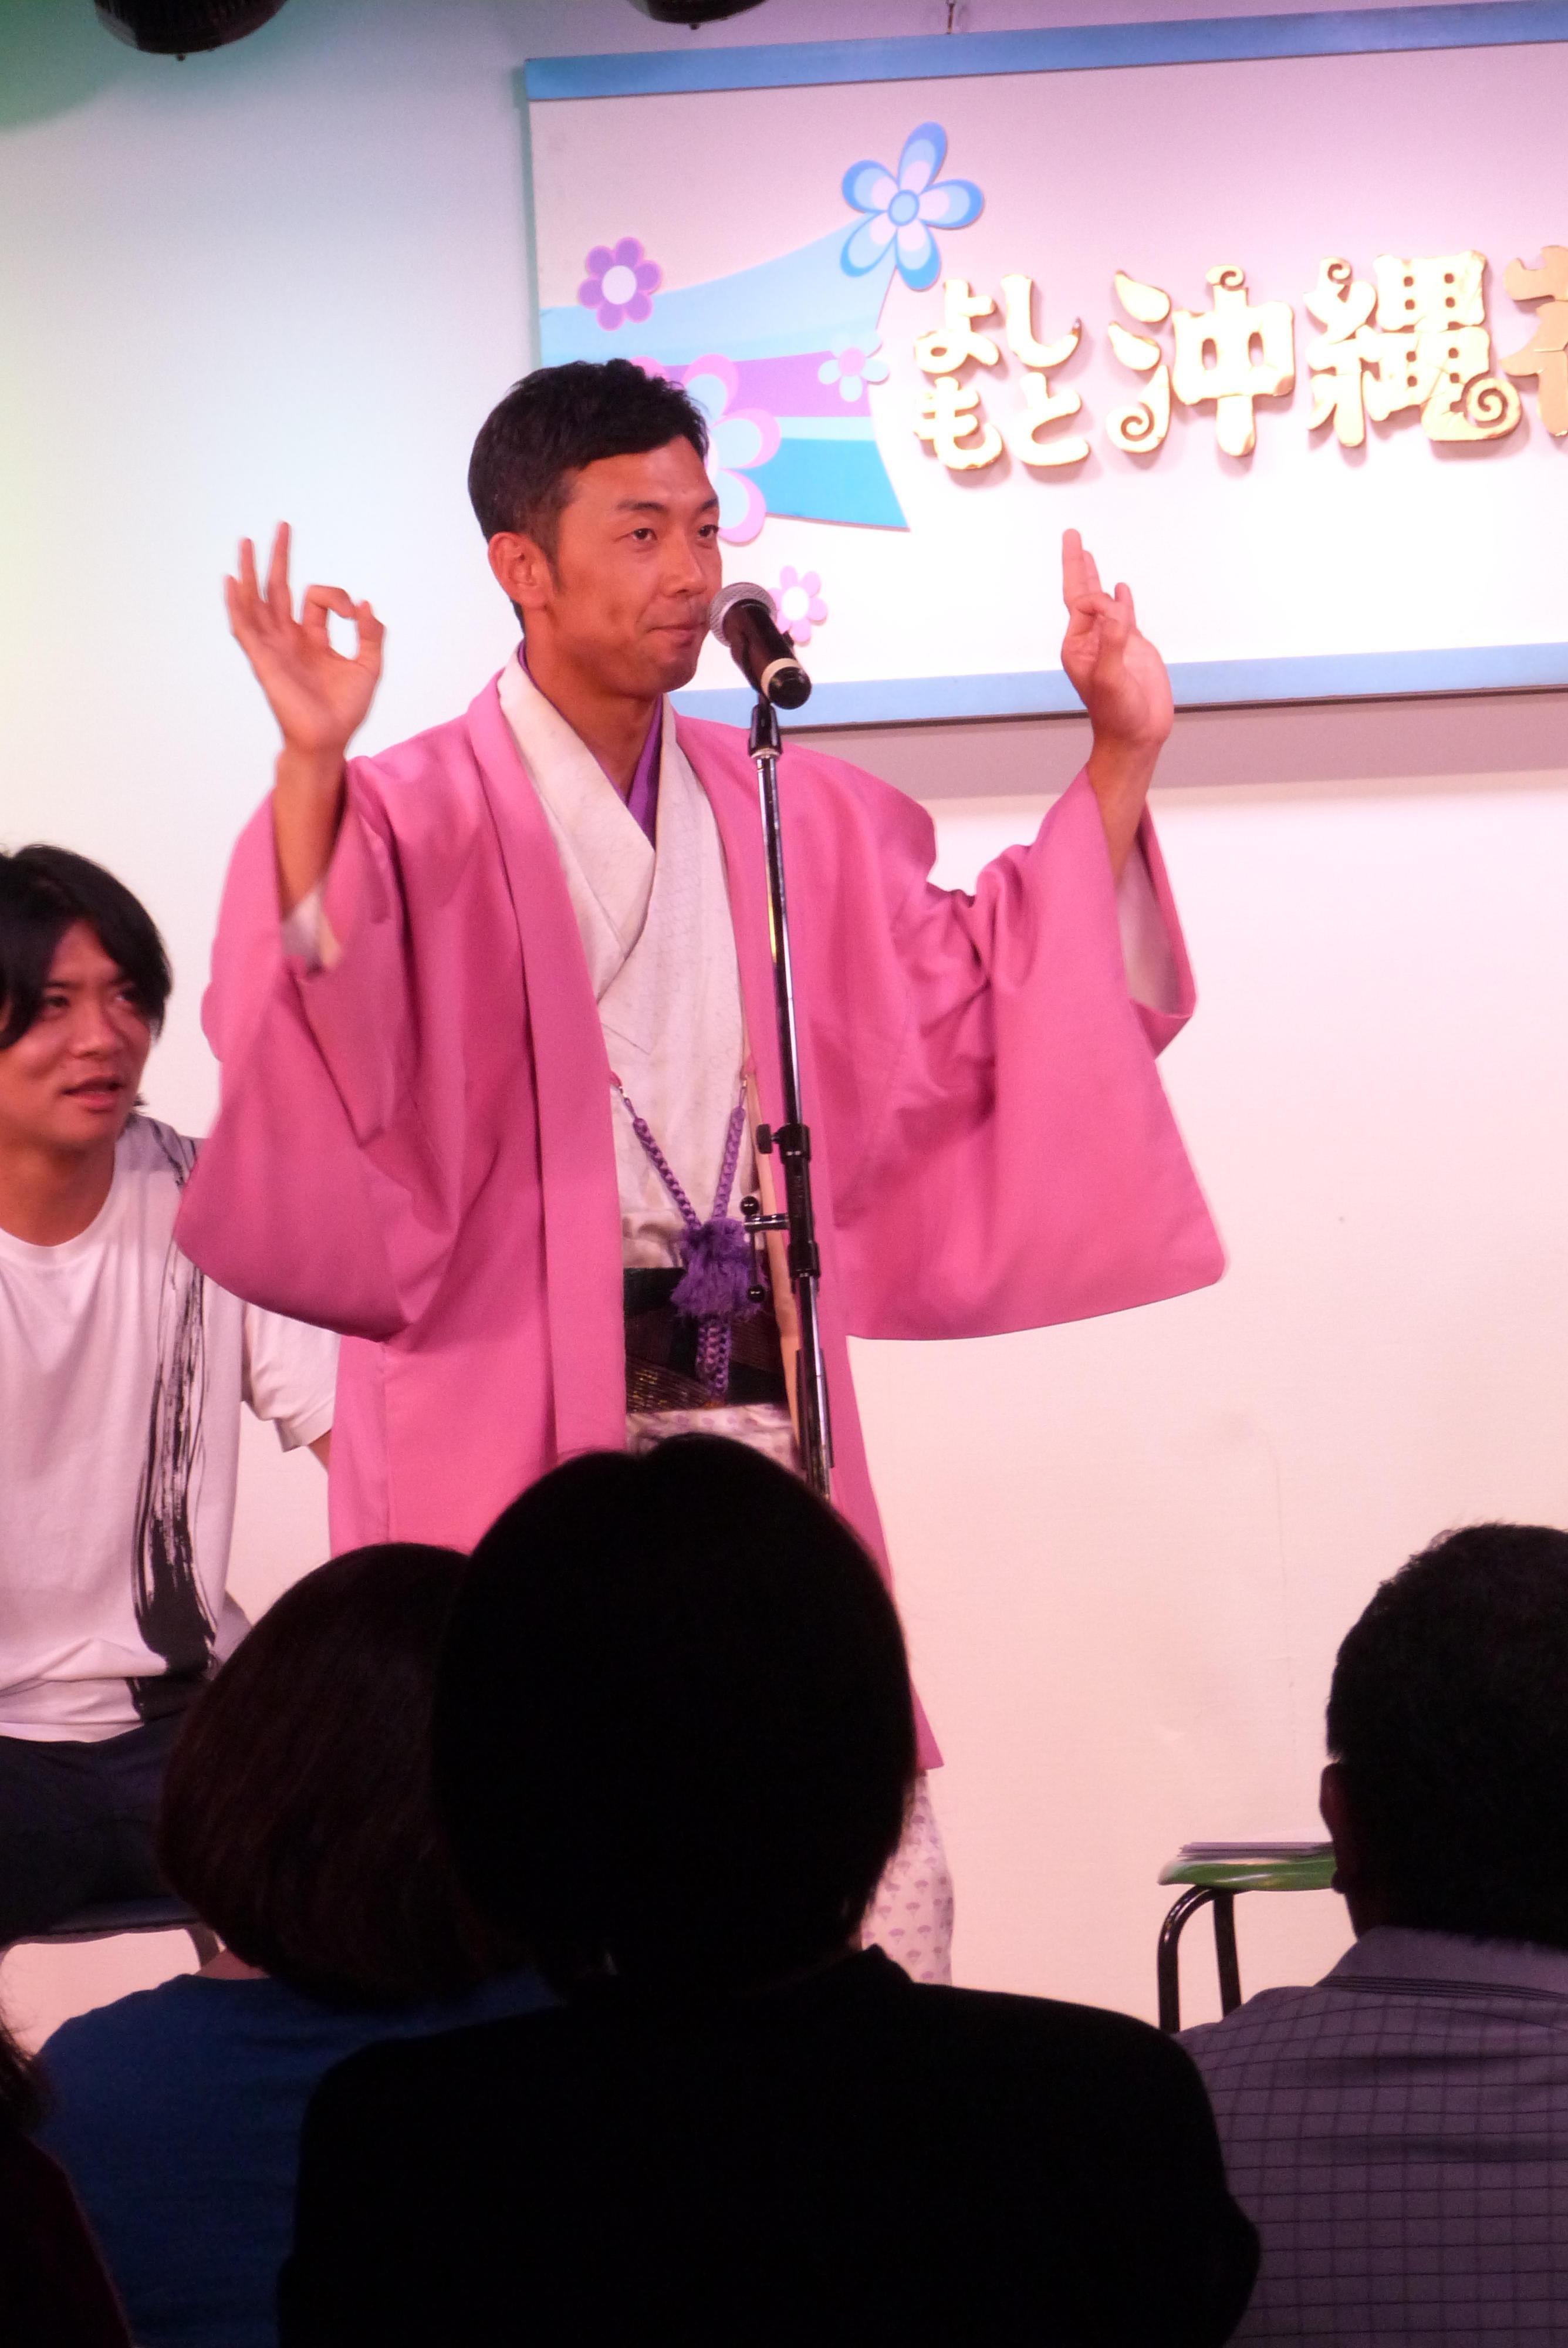 http://news.yoshimoto.co.jp/20180822204002-1c1917dcf520452593da02f480d293c1a408fb74.jpg